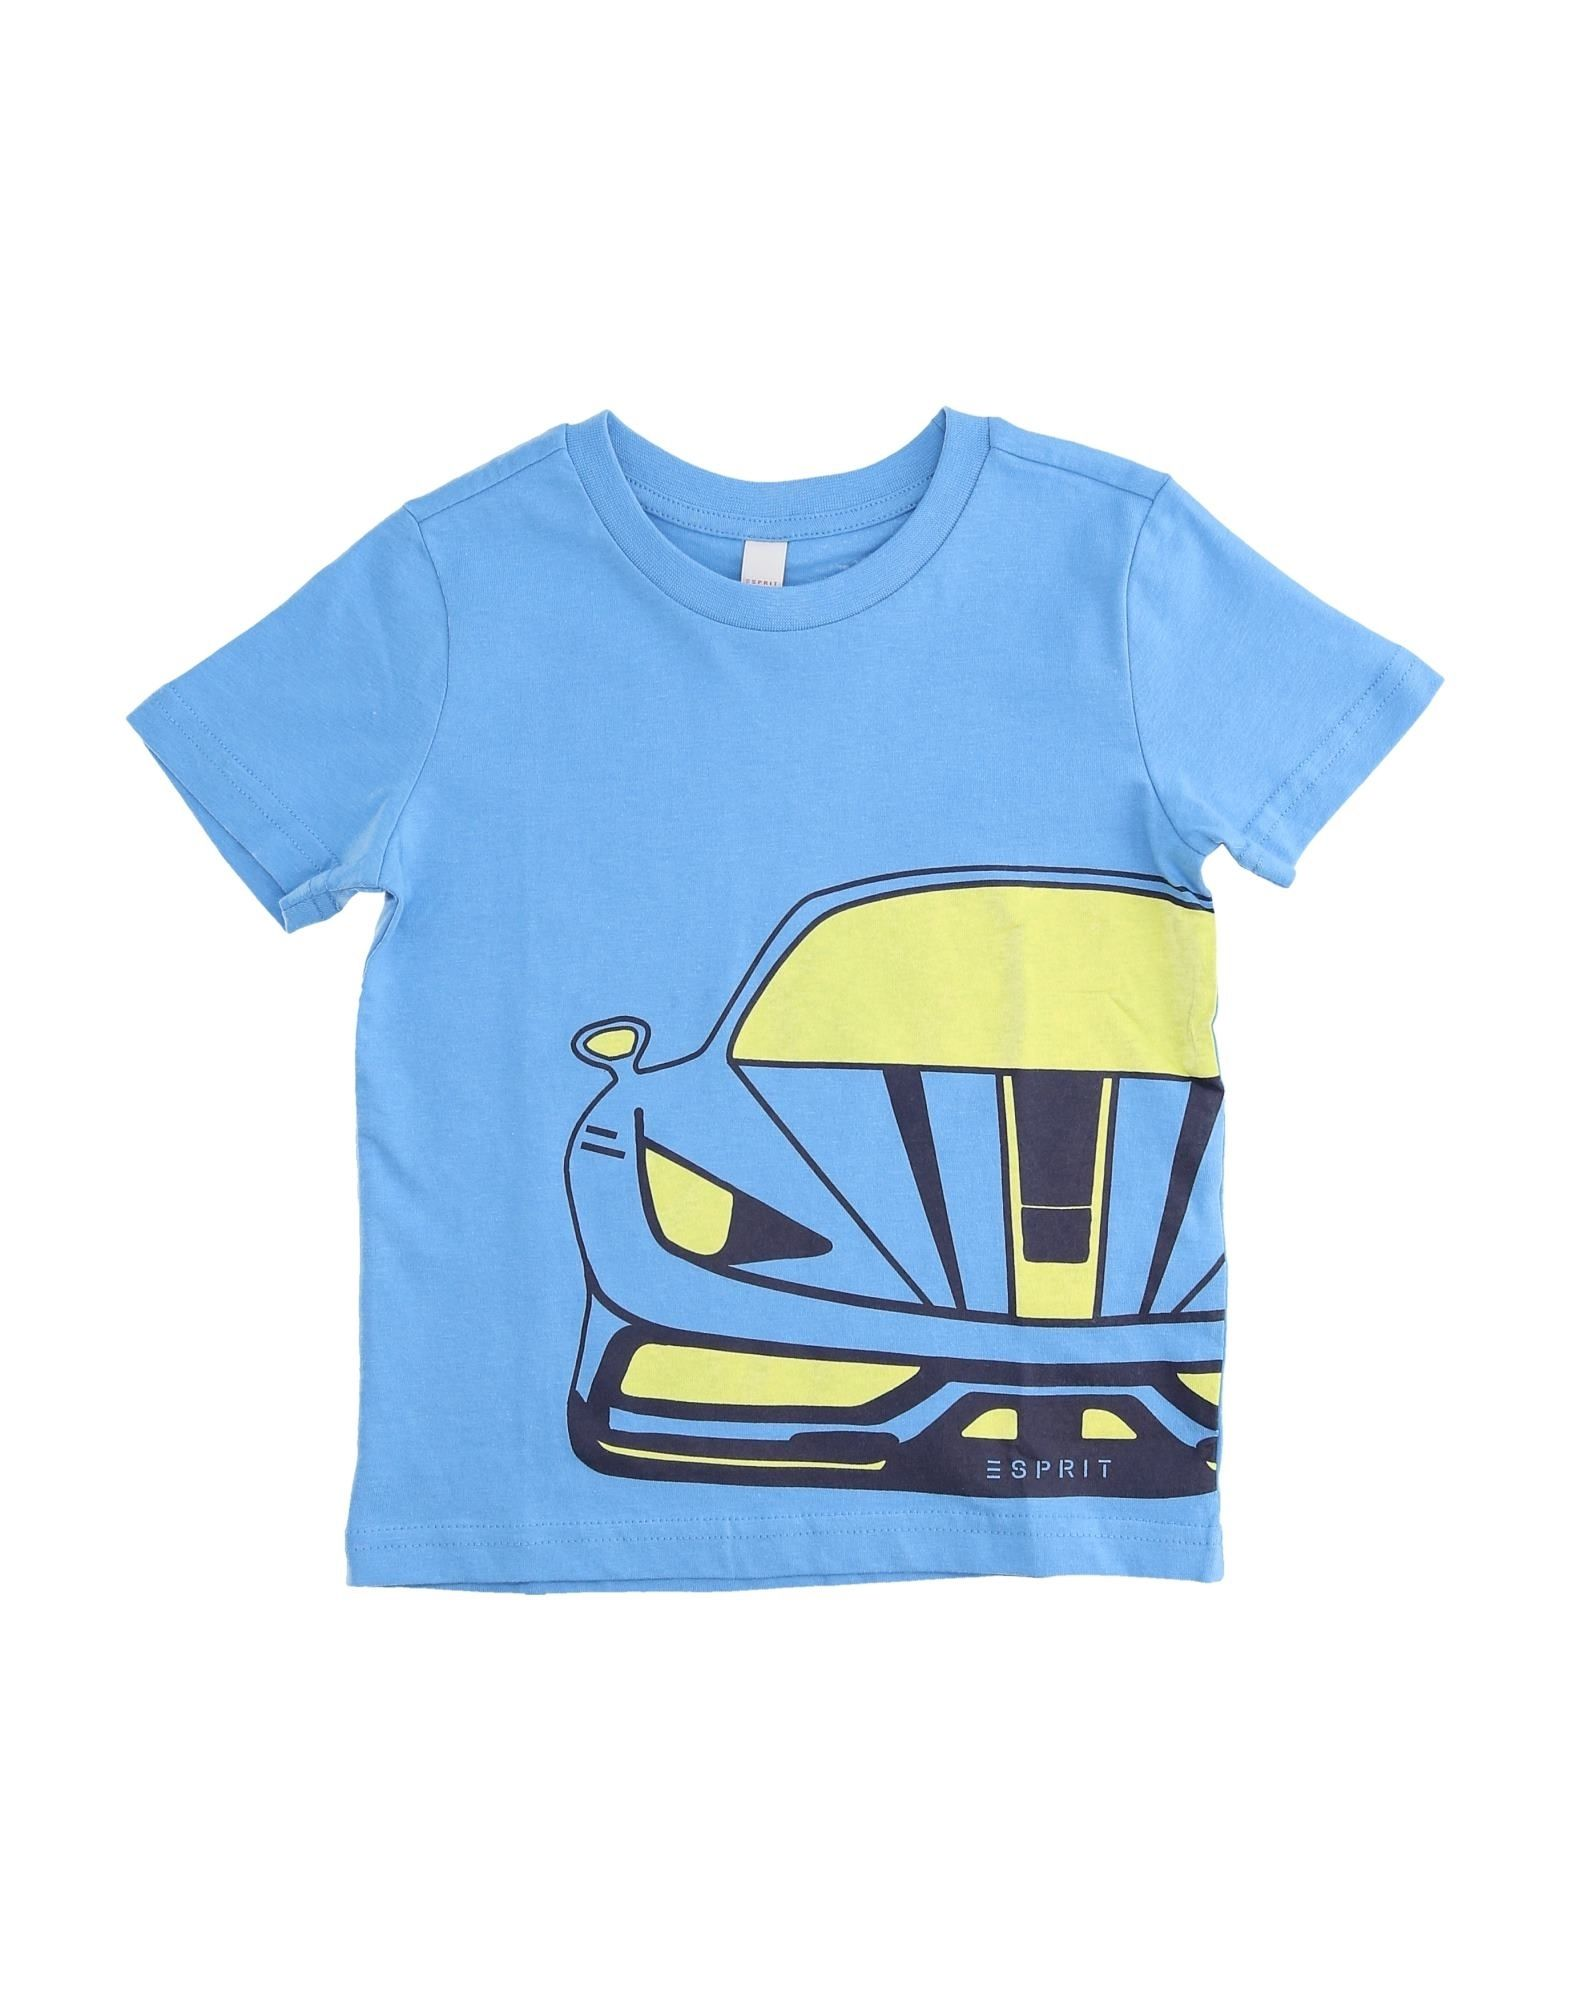 ESPRIT Футболка футболка esprit 055ee1k010 875 299 2015